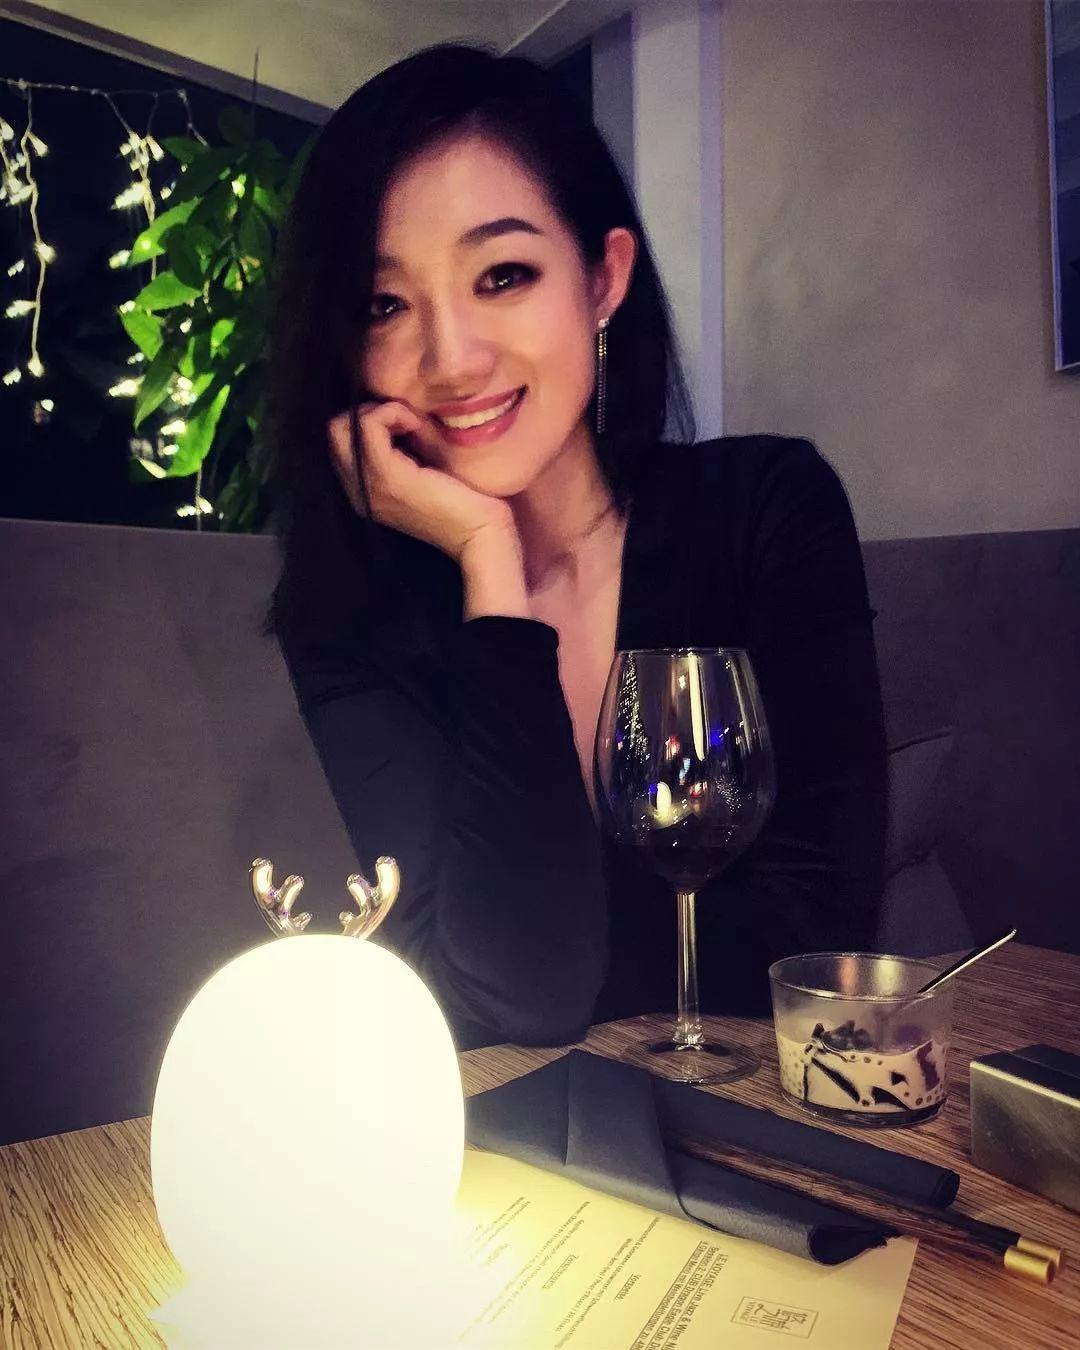 CUB 2019中德龙鹰爵士之夜晚餐会@Le Voyage 精彩回顾